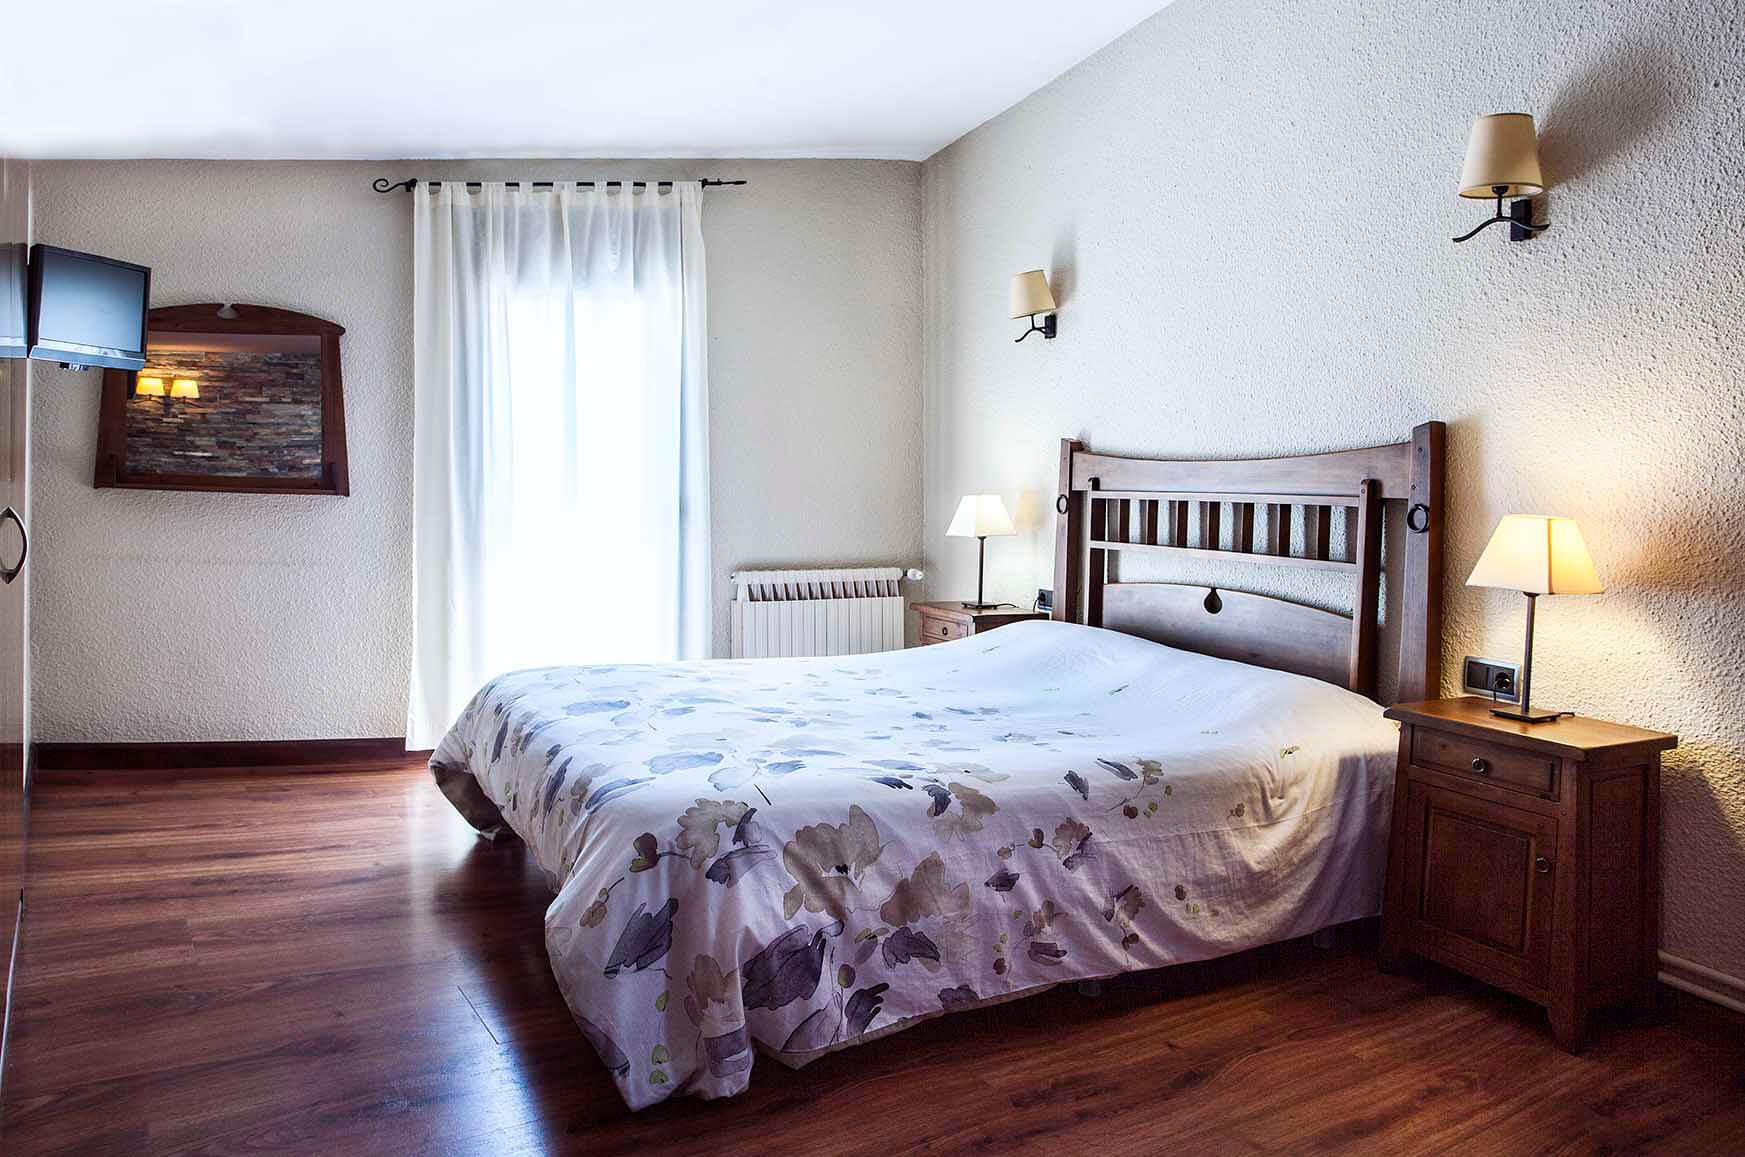 Habitació doble Hostal la Plaça Vall de Boí